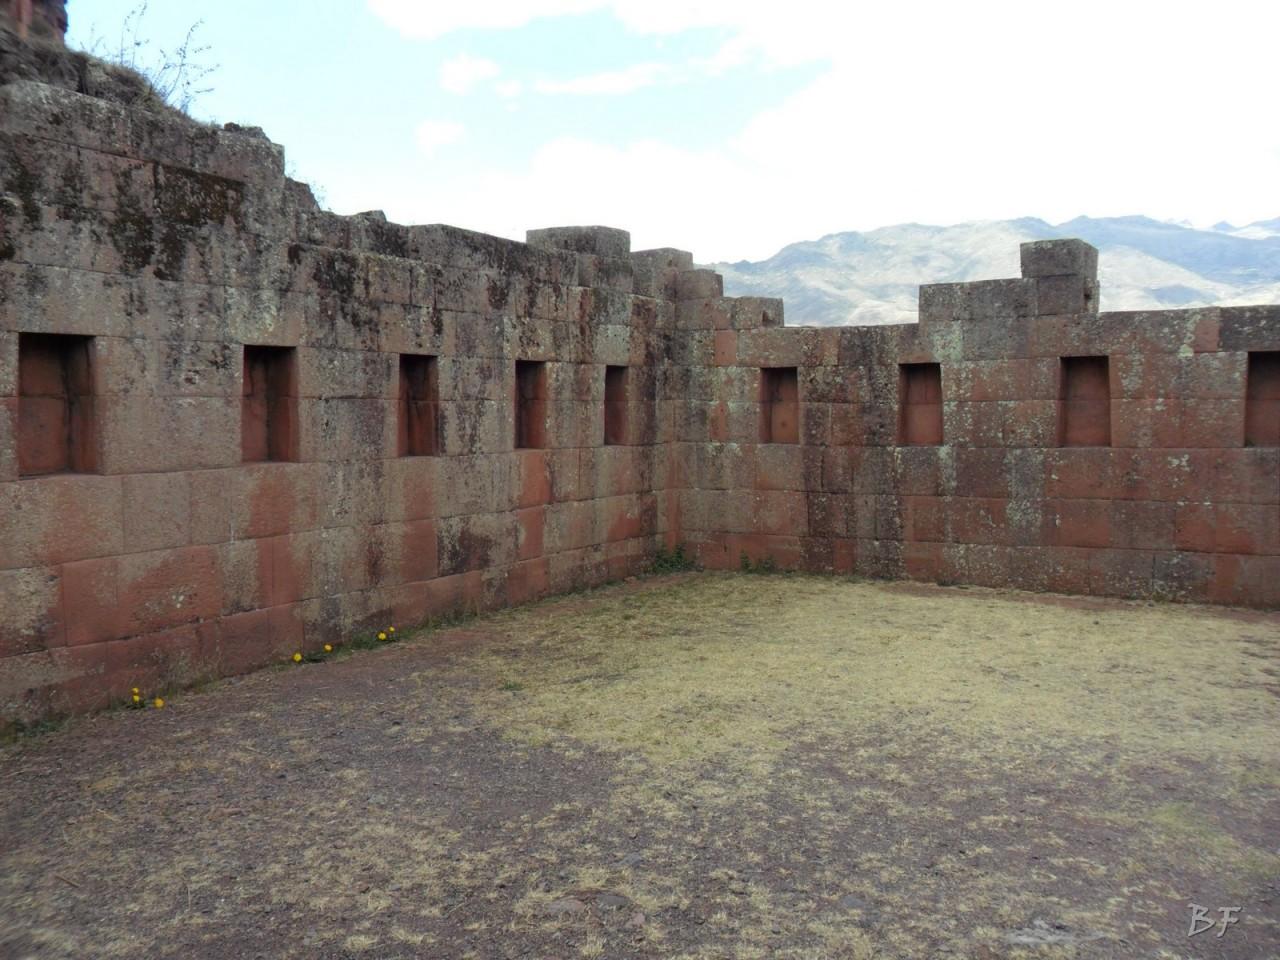 Mura-Poligonali-Megaliti-Altari-Rupestri-Pisac-Cusco-Perù-50